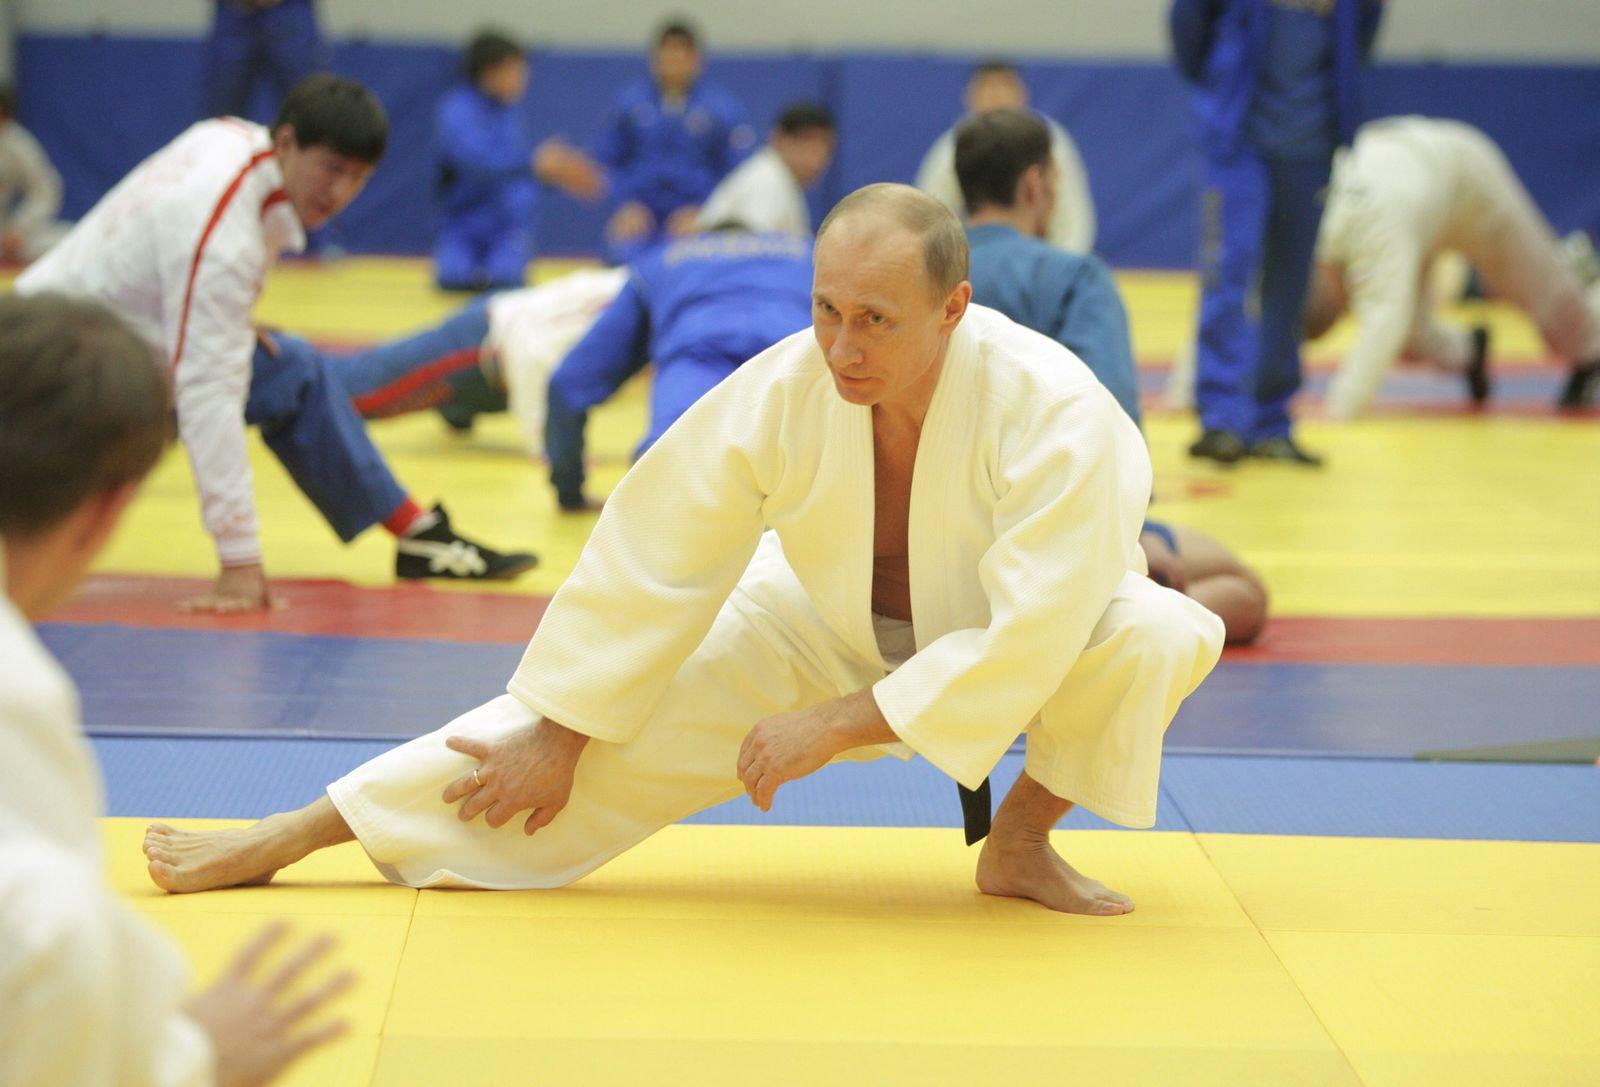 Russian Prime Minister Vladimir Putin attends judo training session in St. Petersburg